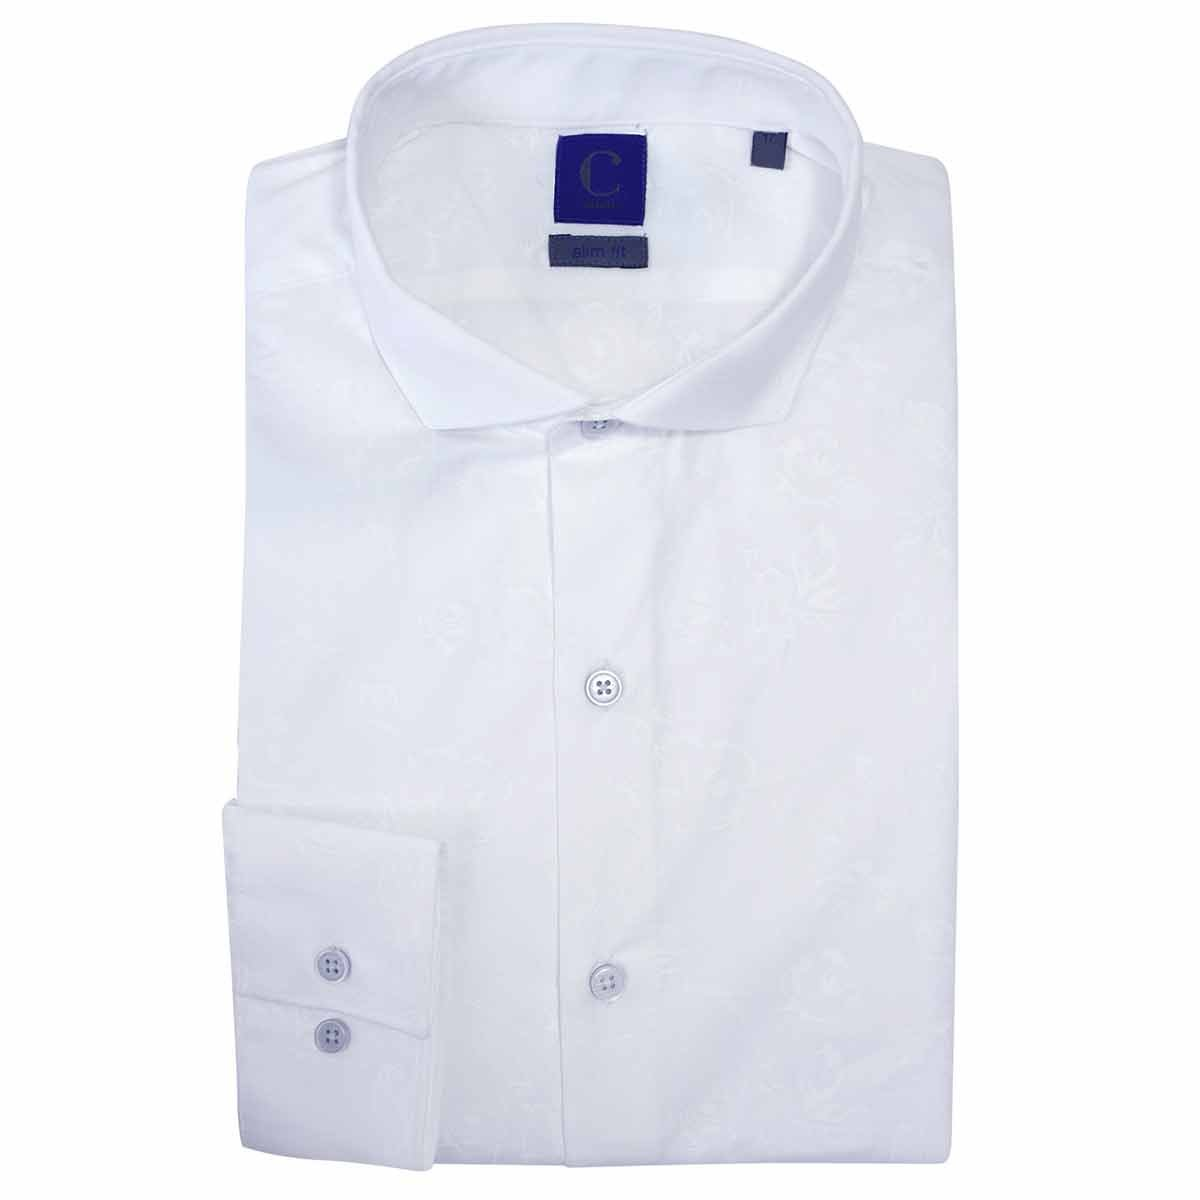 8ff8fe8b605 Camisa estampada C by Cavalier